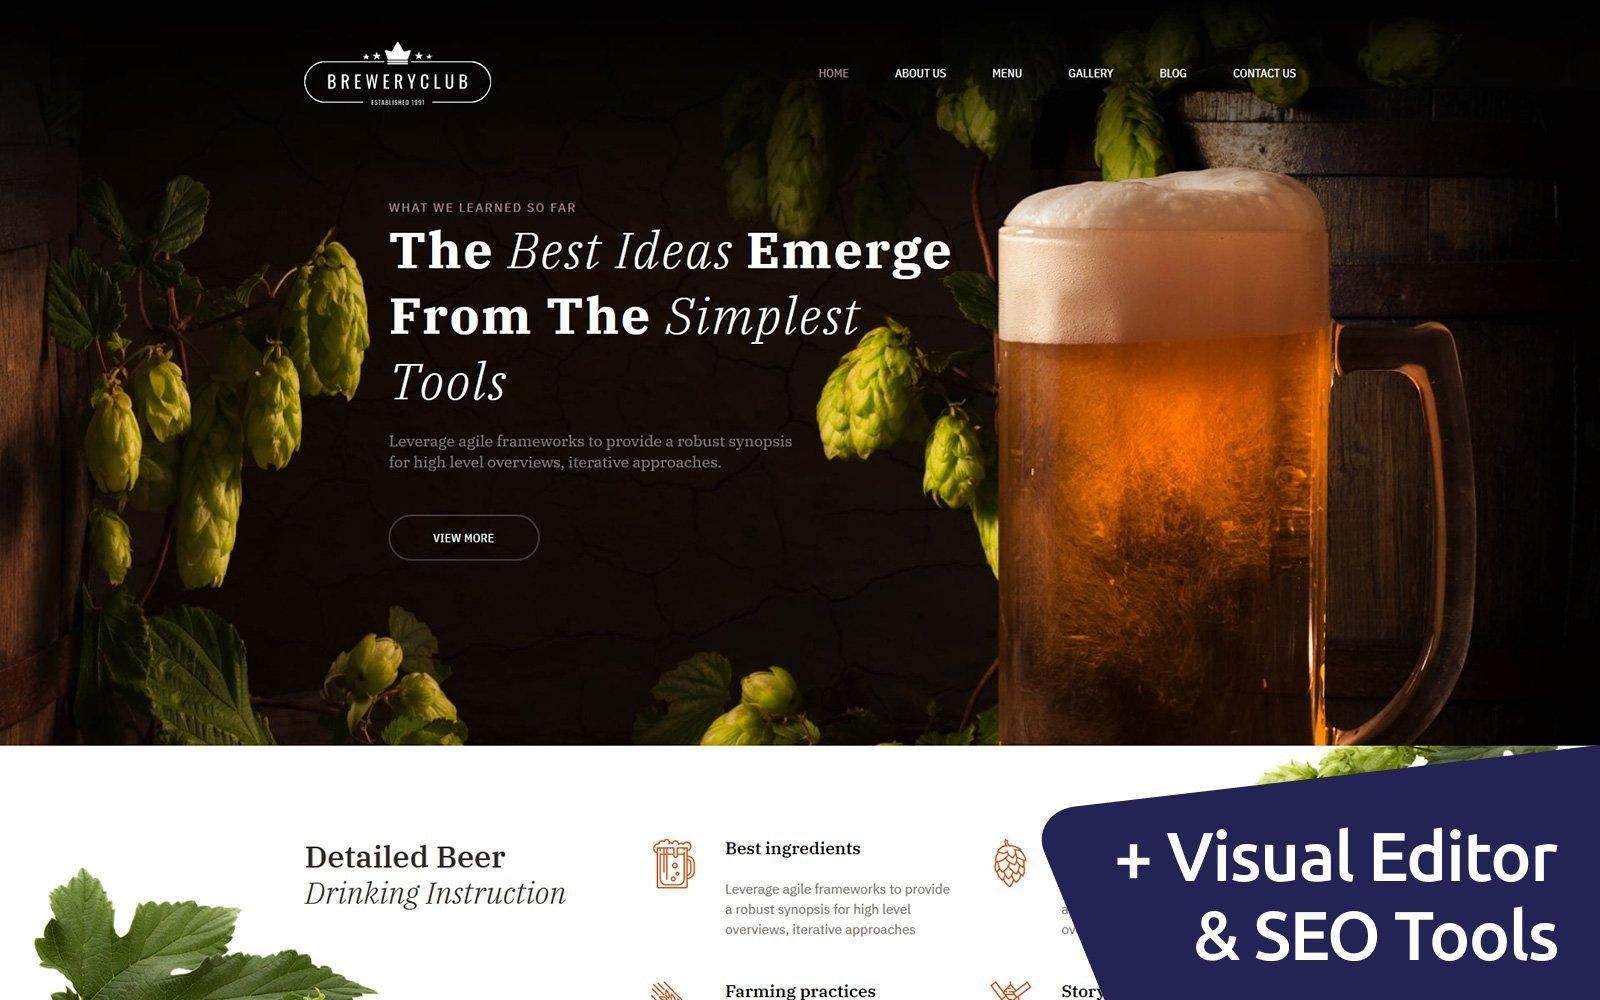 Brewery Club Premium Templates Moto CMS 3 №68191 - screenshot